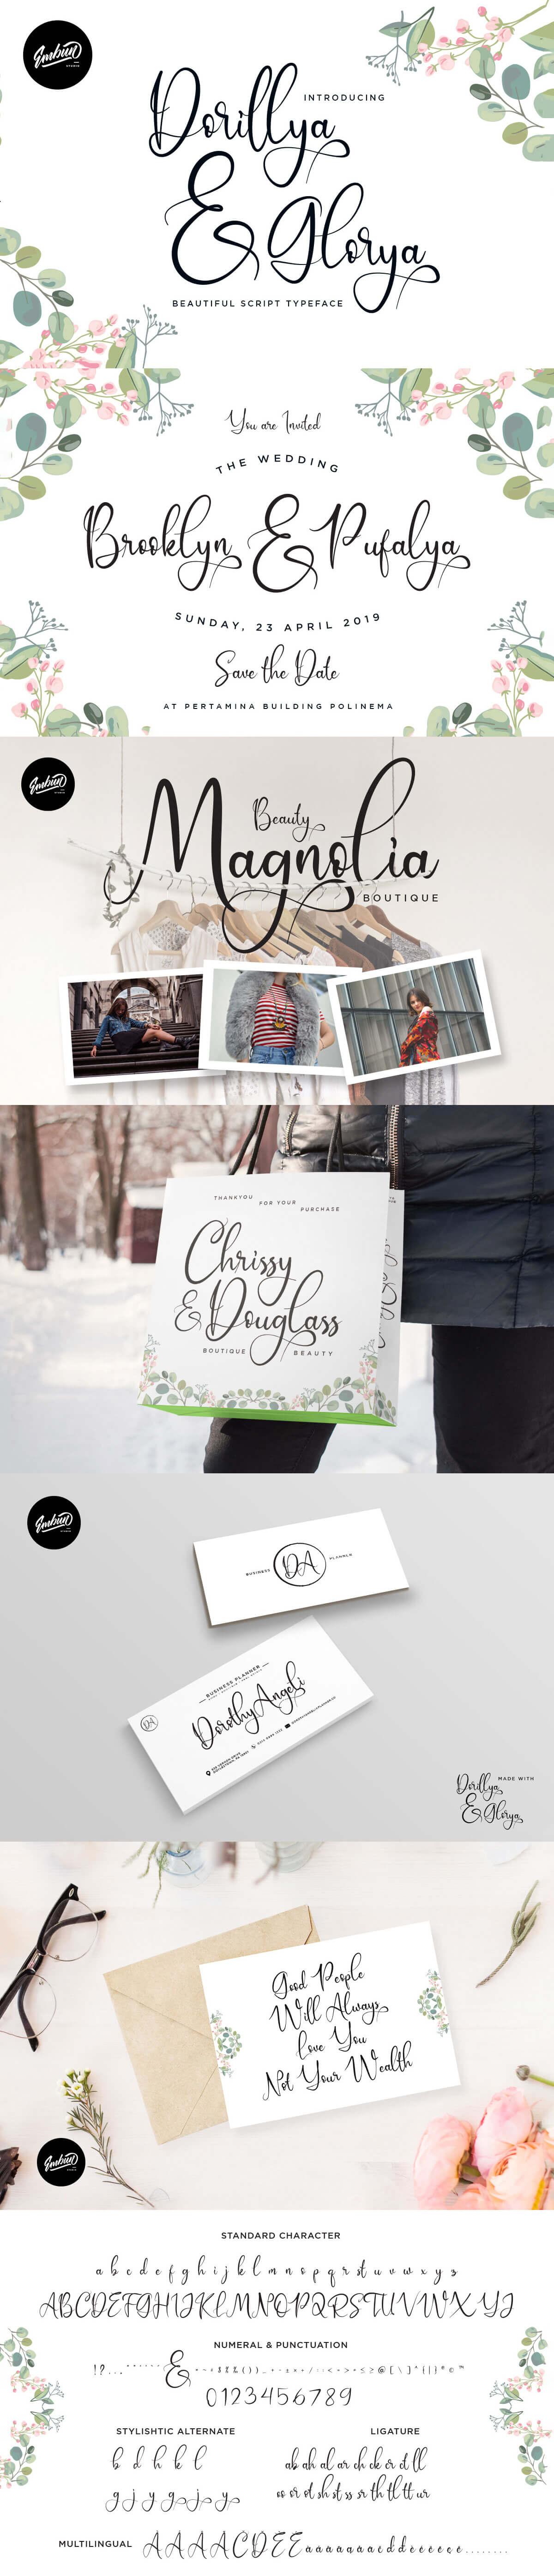 Free Dorillya & Glorya Calligraphy Font